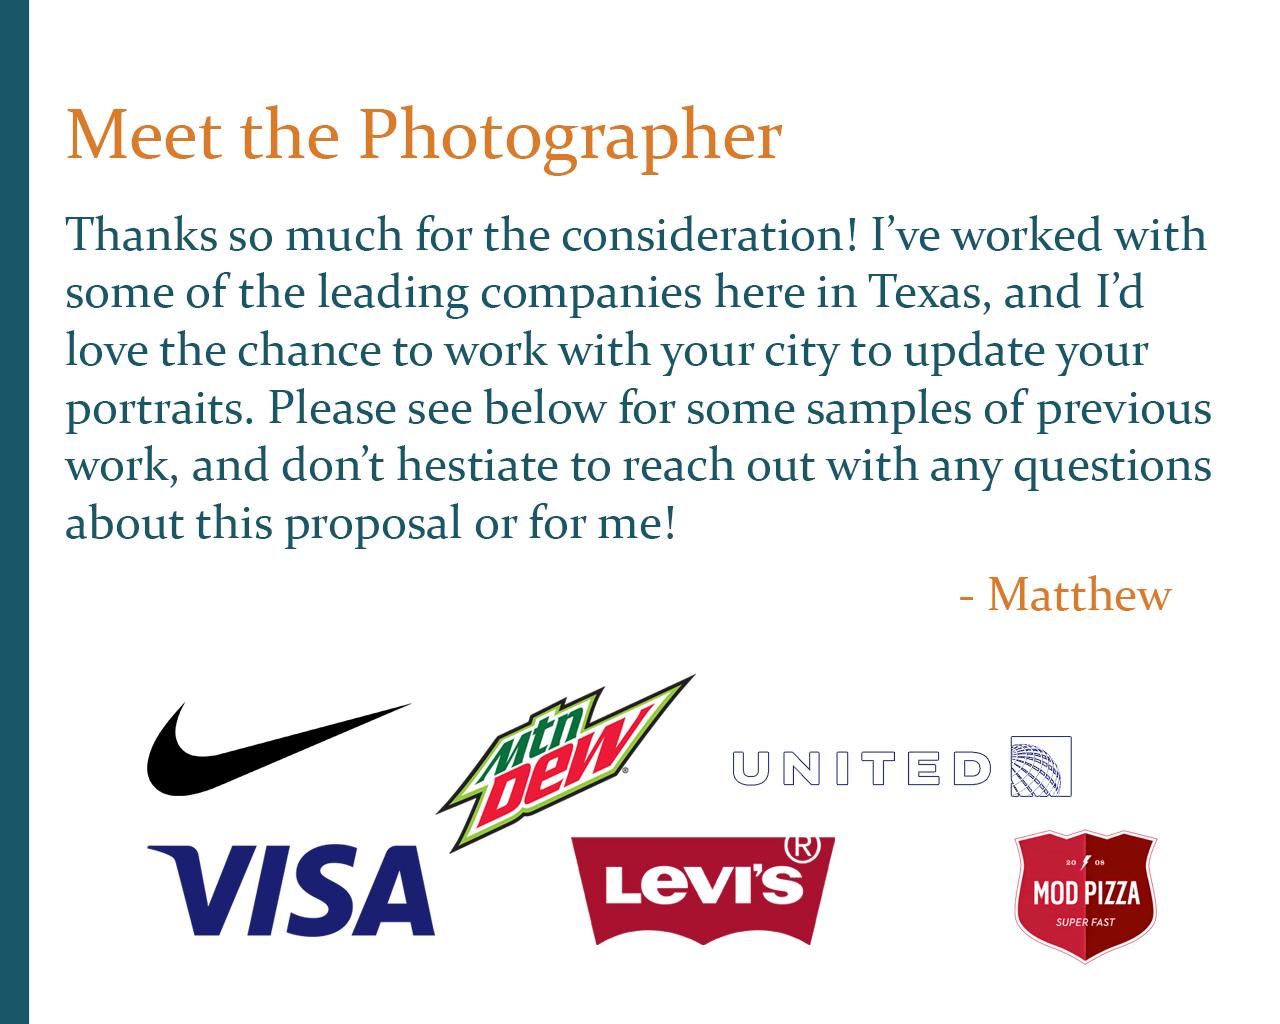 City of Georgetown Photo Revamp Proposal - Meet the Photographer.jpg